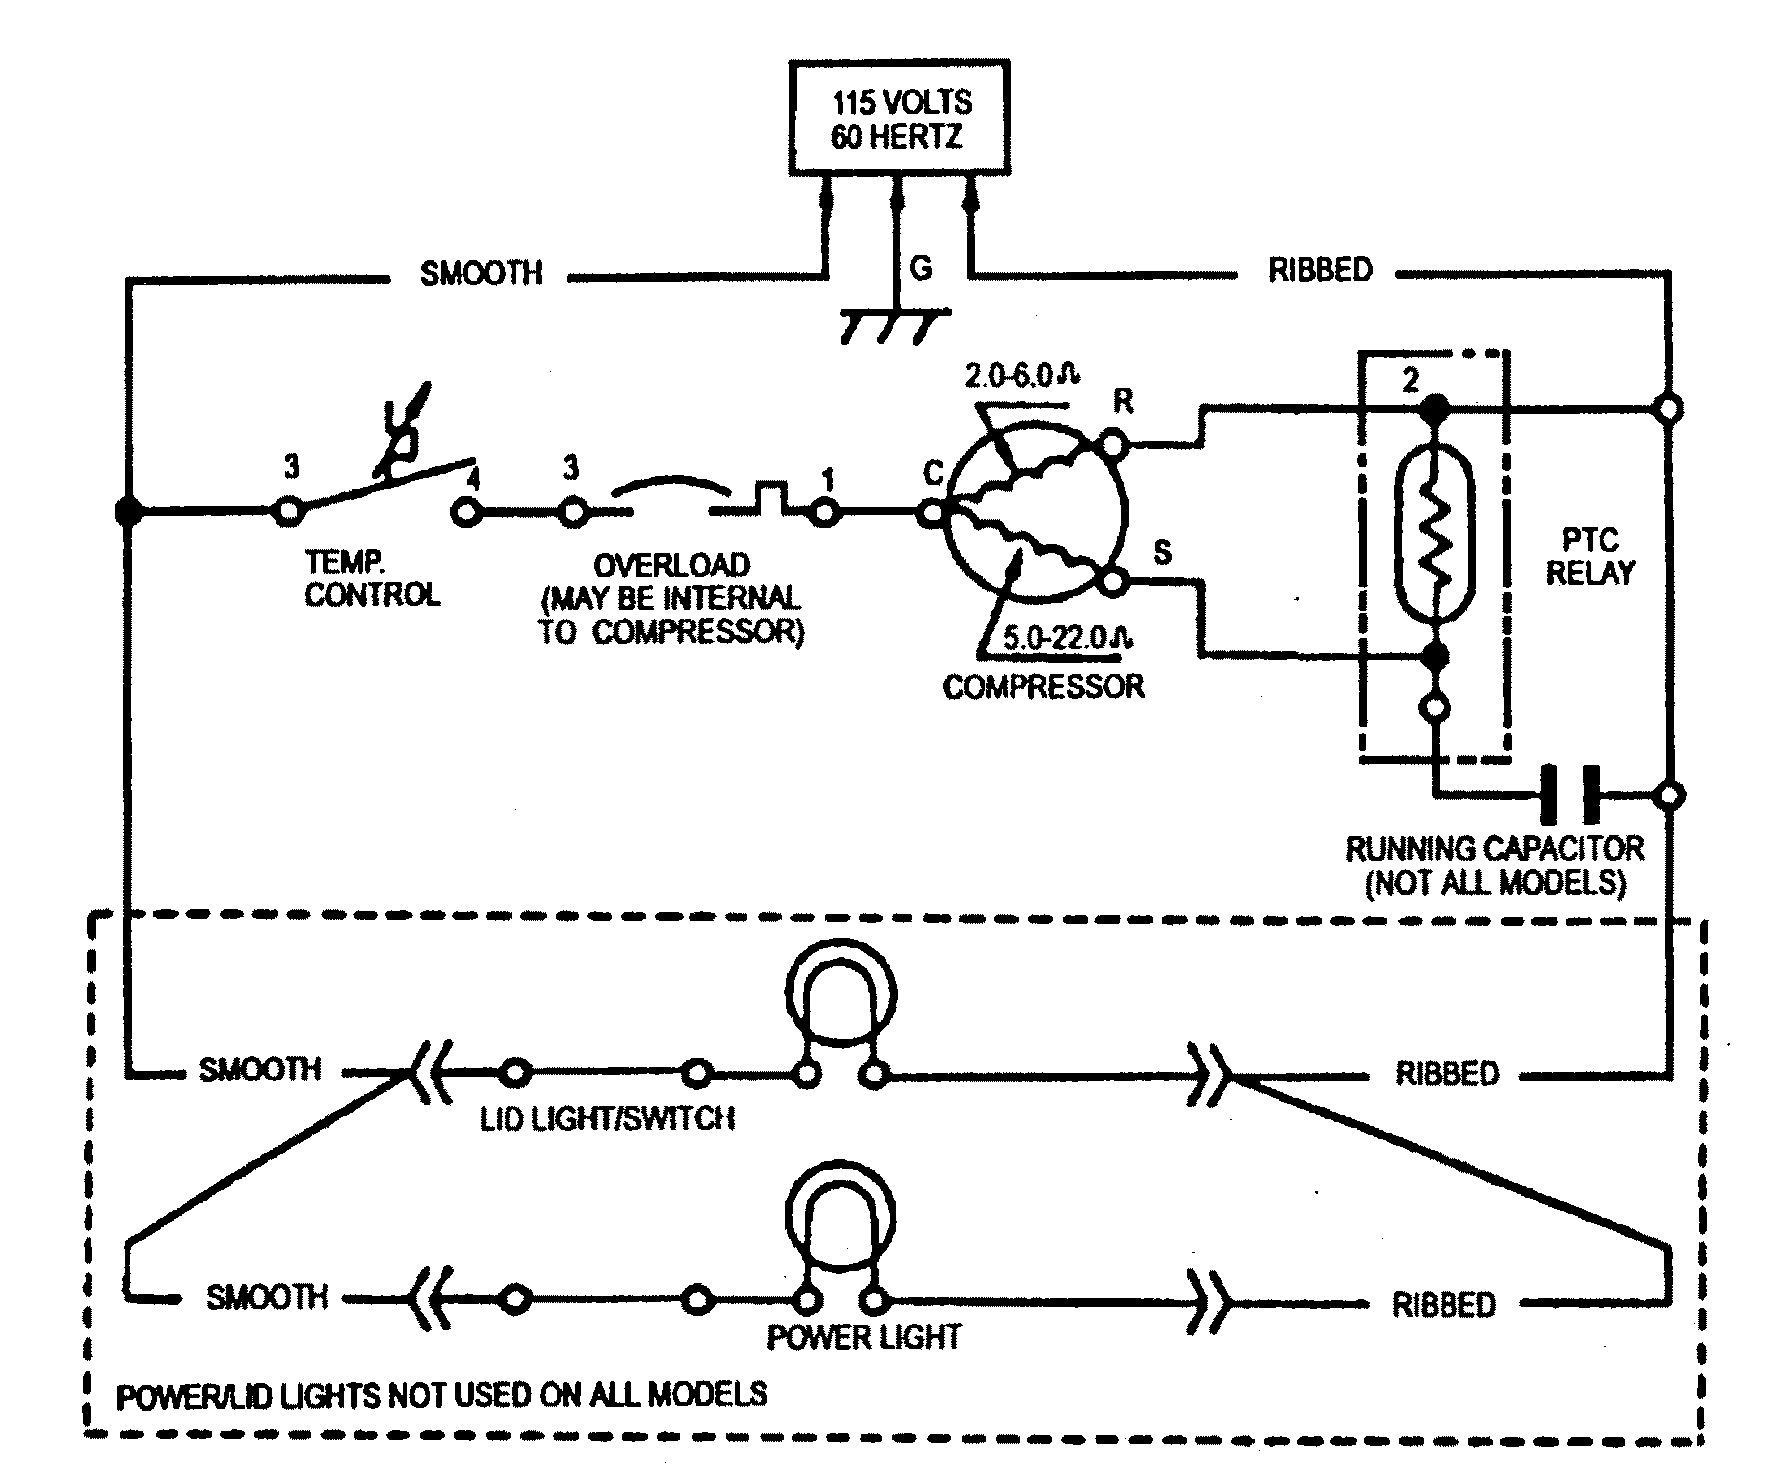 electrical wiring diagram refrigeration ss 2274  wiring diagram for whirlpool fridge freezer download diagram  wiring diagram for whirlpool fridge